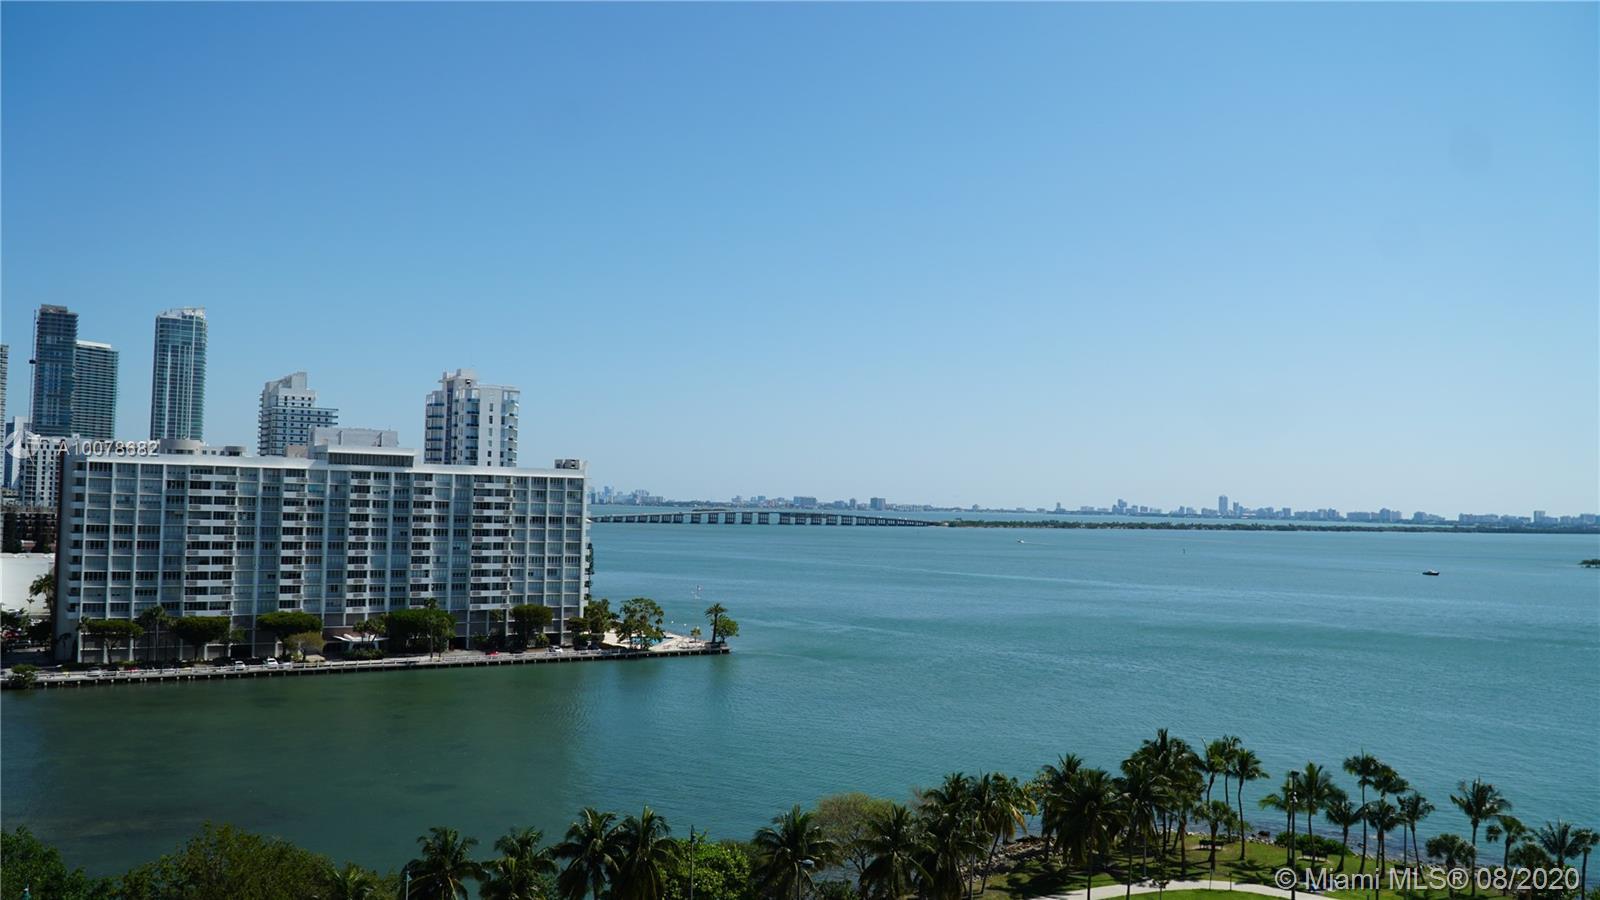 1900 N Bayshore Dr Miami, FL 33132